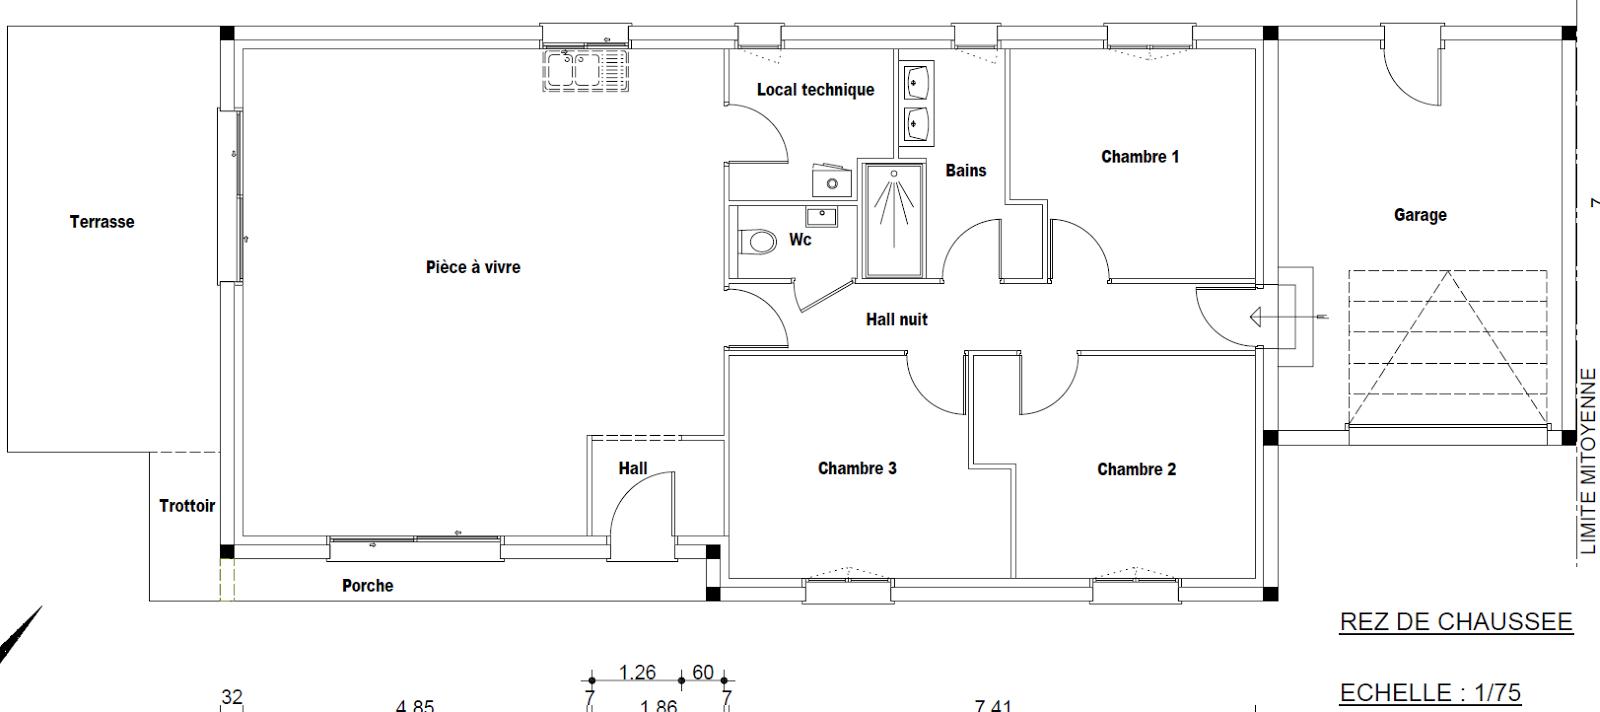 ma troisi me maison sera rt 2012 plan maison. Black Bedroom Furniture Sets. Home Design Ideas